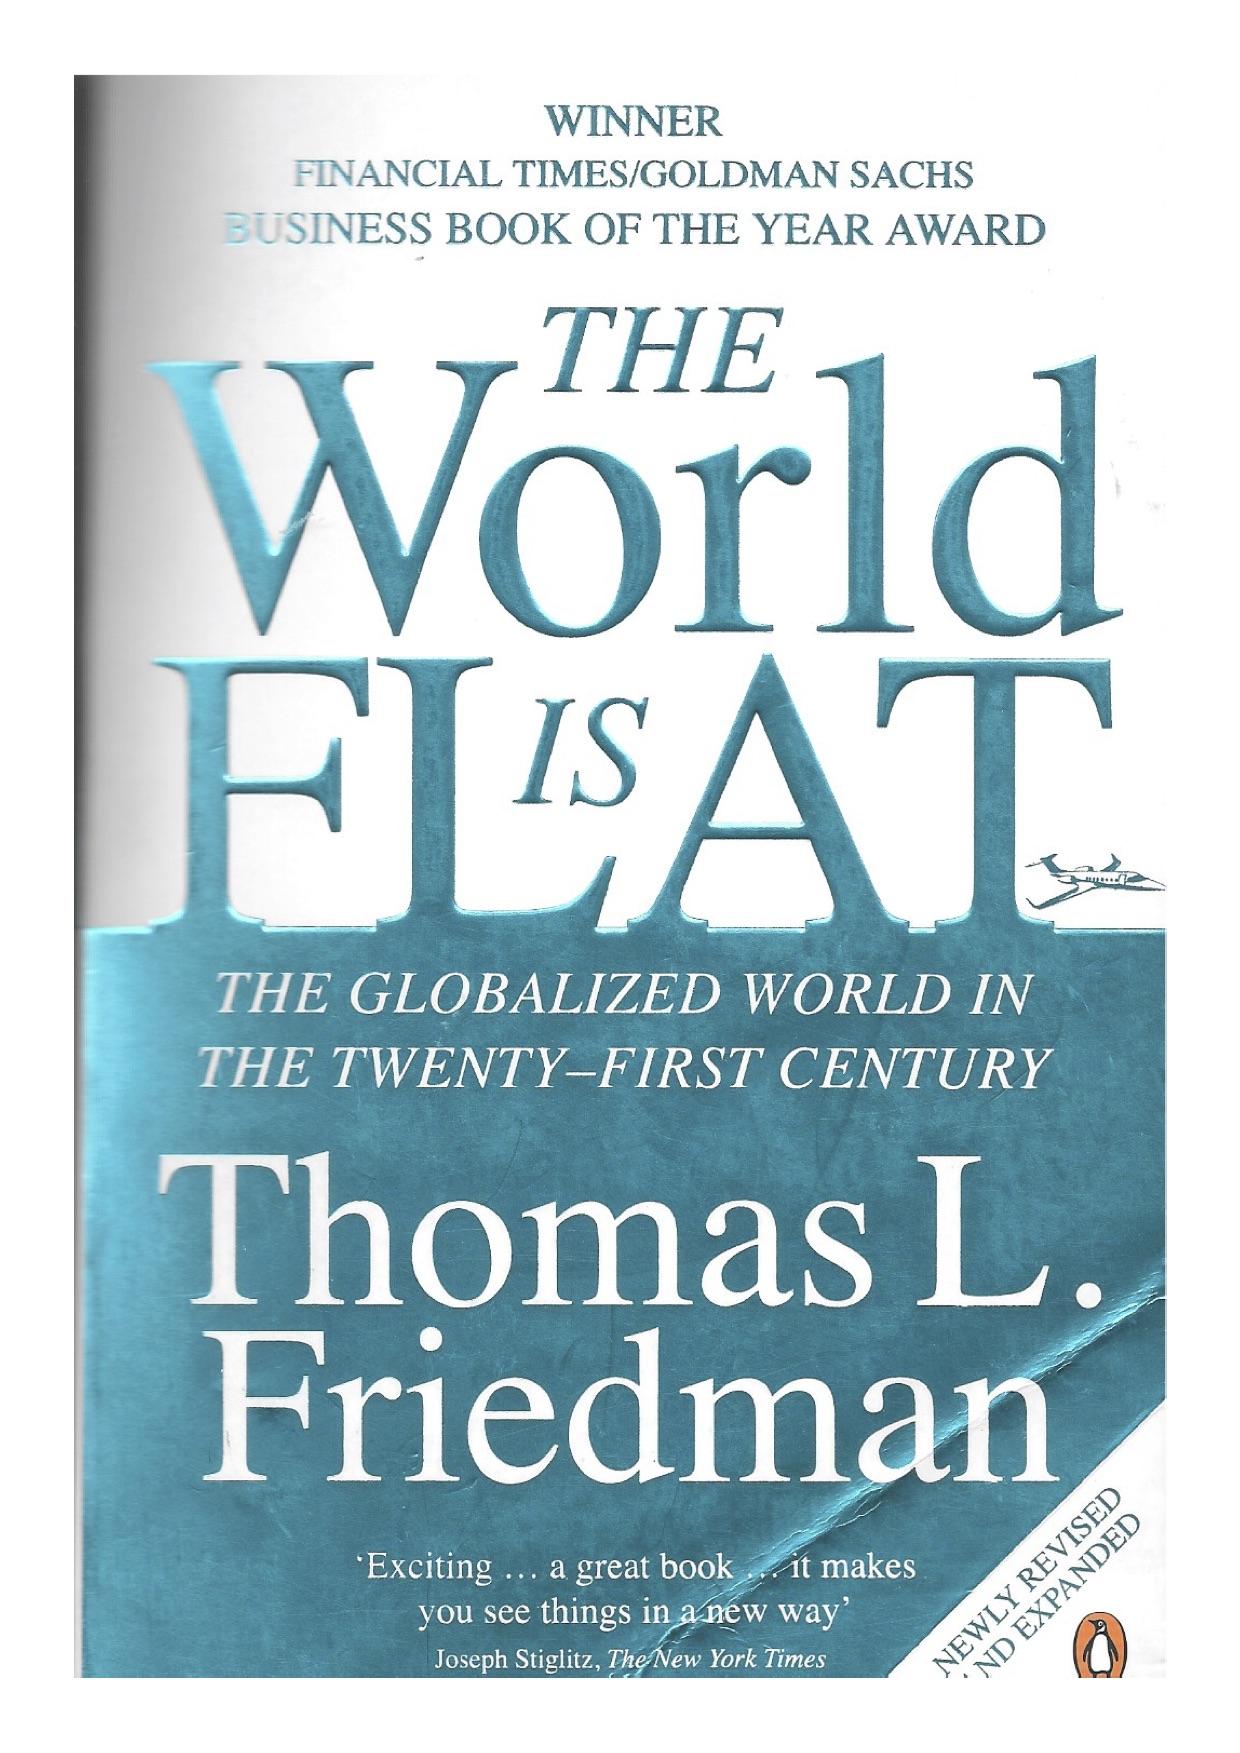 The World Is Flat Thomas L Friedman Greatest Hits Blog The Best Business Books Summerised